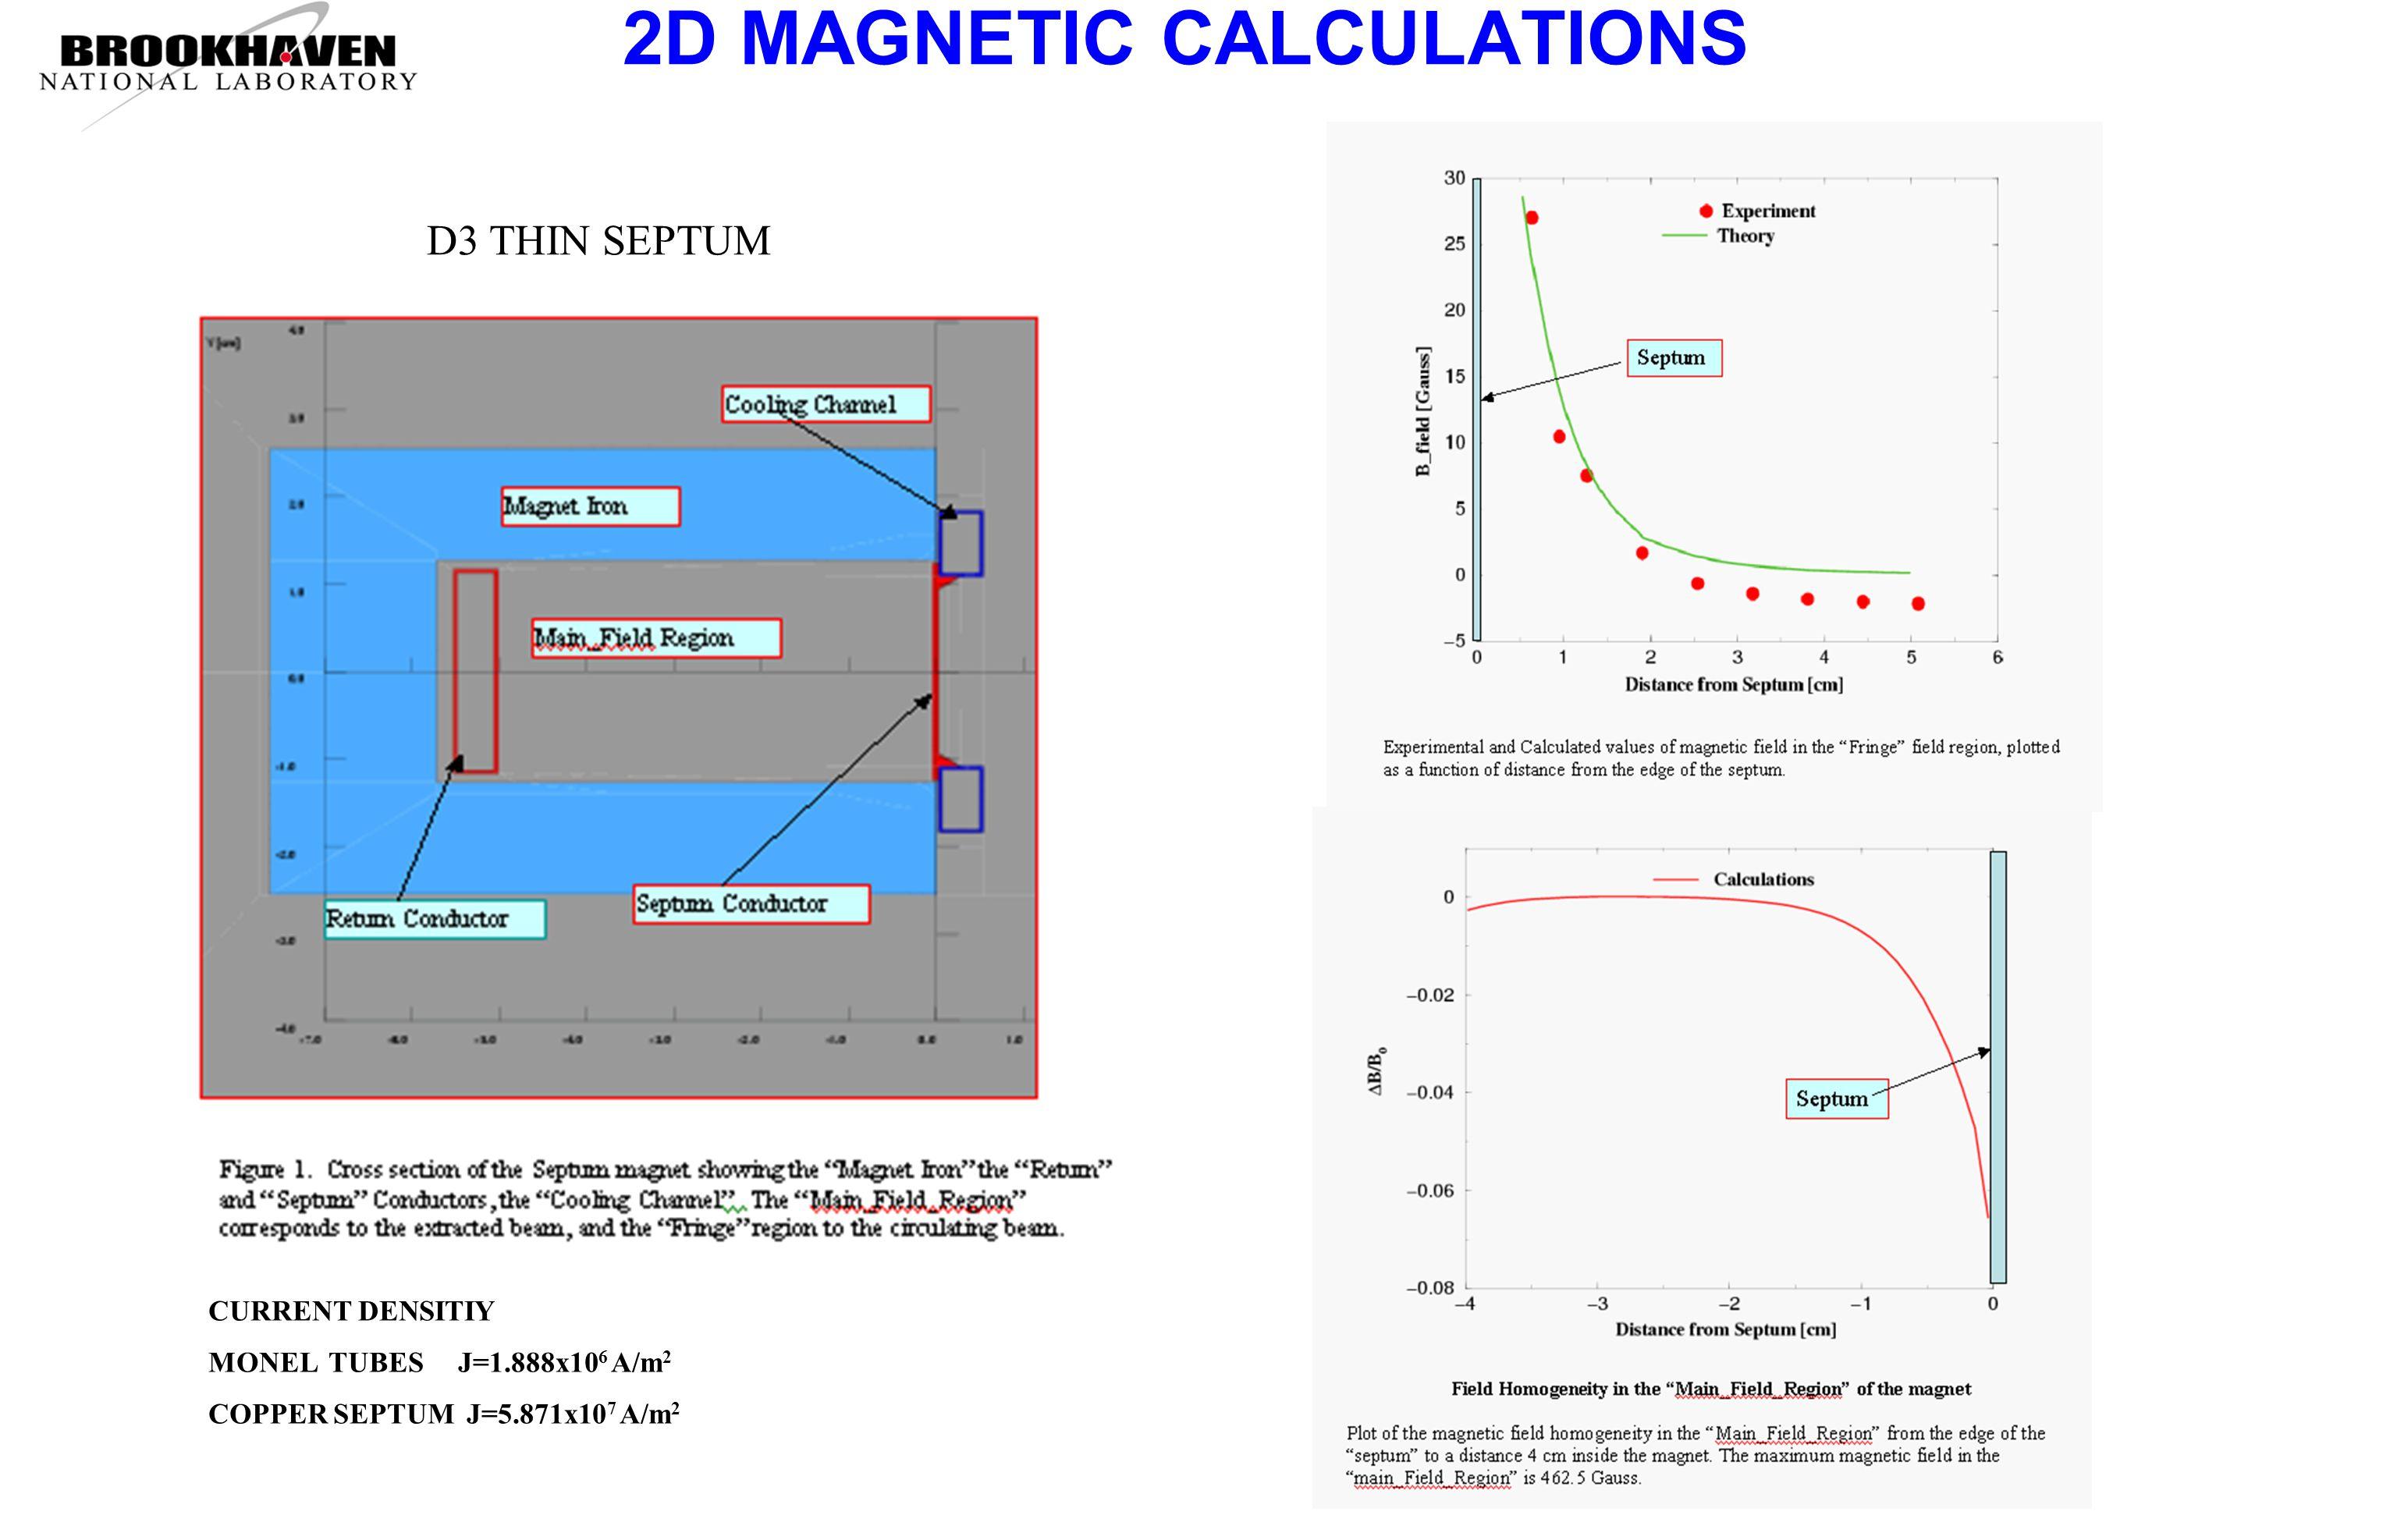 2D MAGNETIC CALCULATIONS CURRENT DENSITIY MONEL TUBES J=1.888x10 6 A/m 2 COPPER SEPTUM J=5.871x10 7 A/m 2 D3 THIN SEPTUM